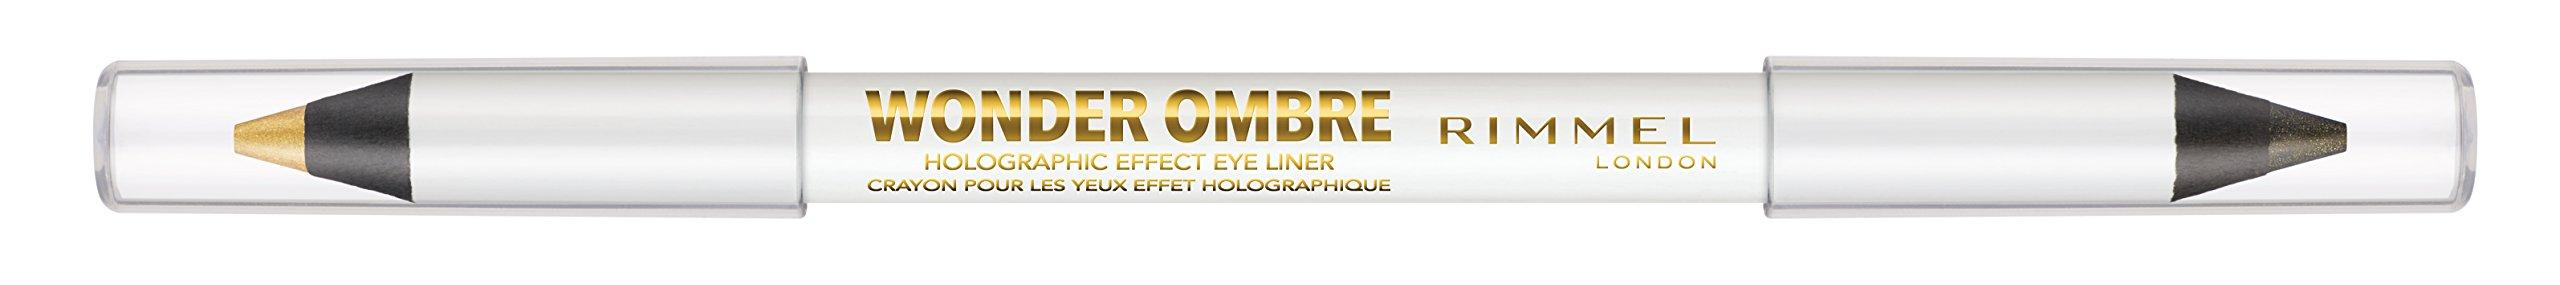 Rimmel Wonder Ombre Eye Liner, Golden Gaze, 0.04 Ounce